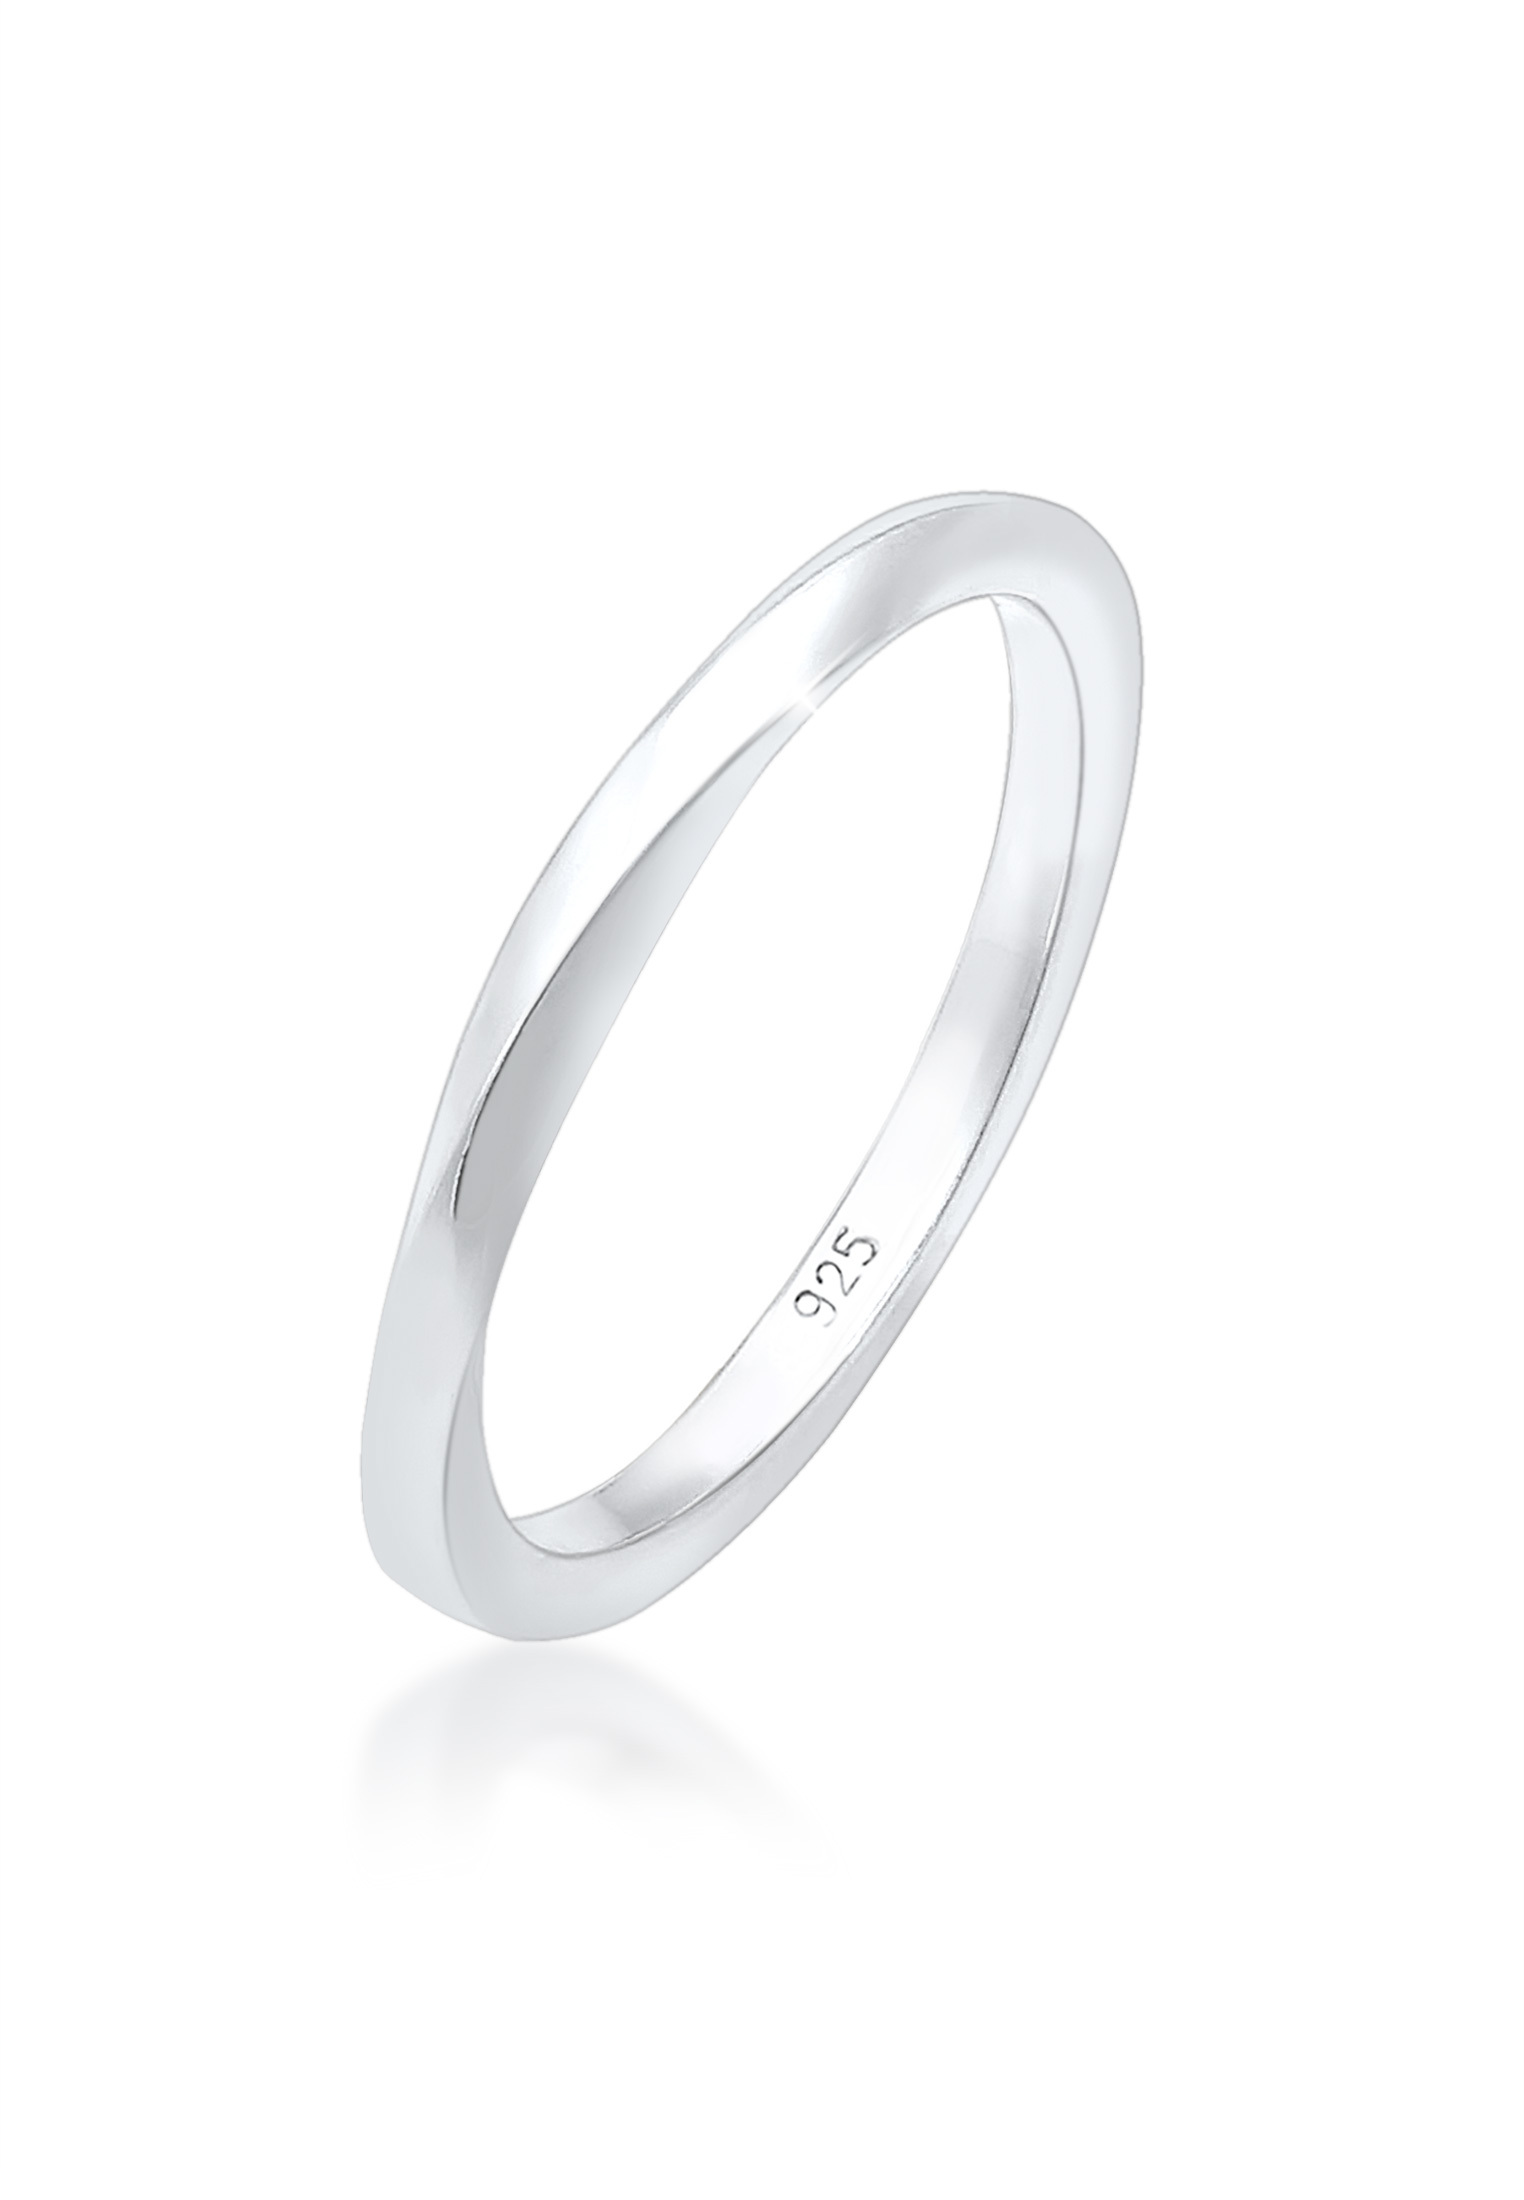 Ring Twisted   925er Sterling Silber